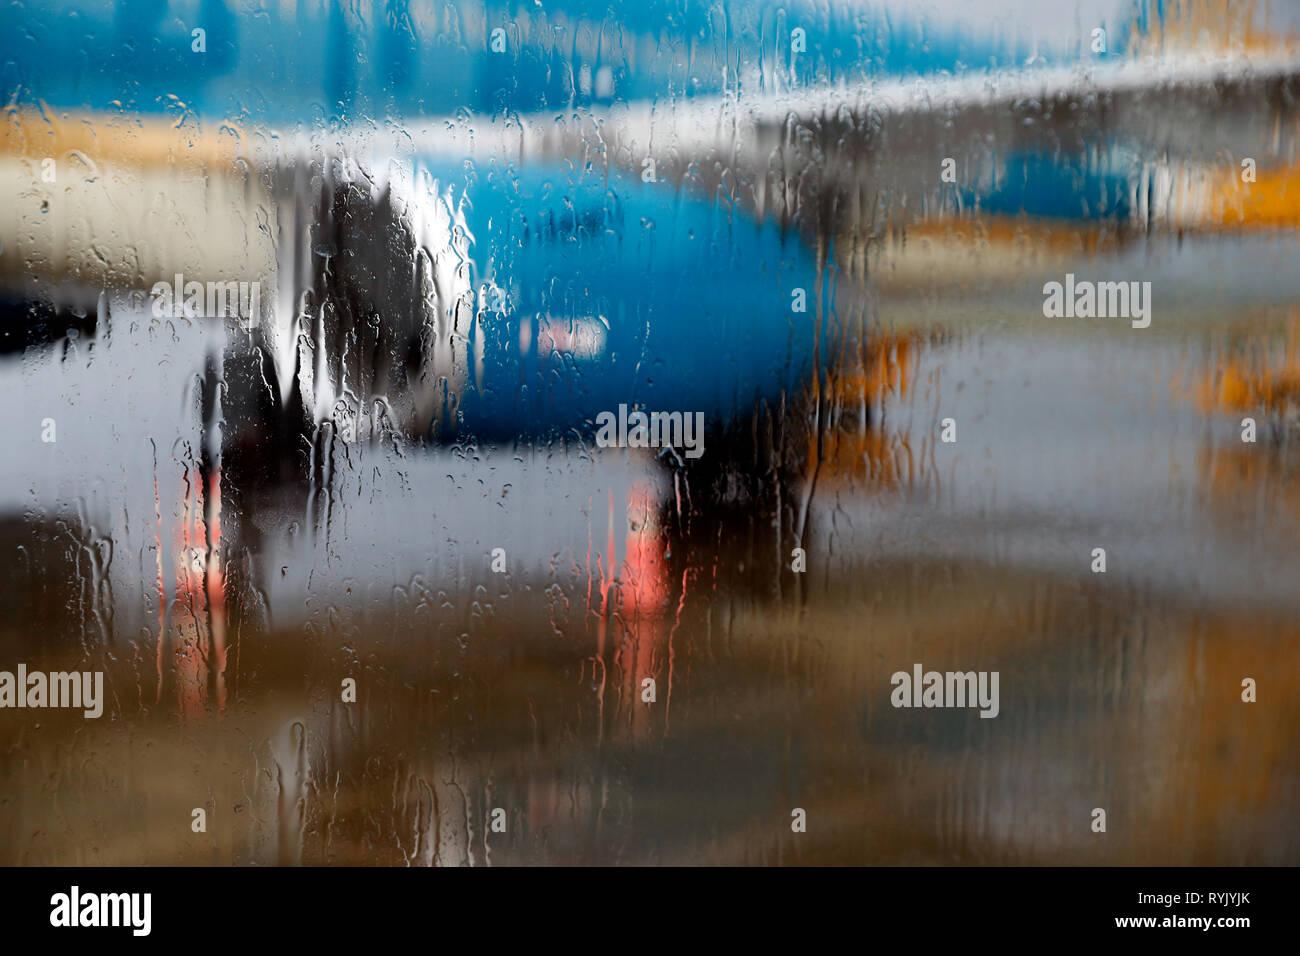 Phuc Quoc airport. Rainy season.  Ho Chi Minh City. Vietnam. - Stock Image